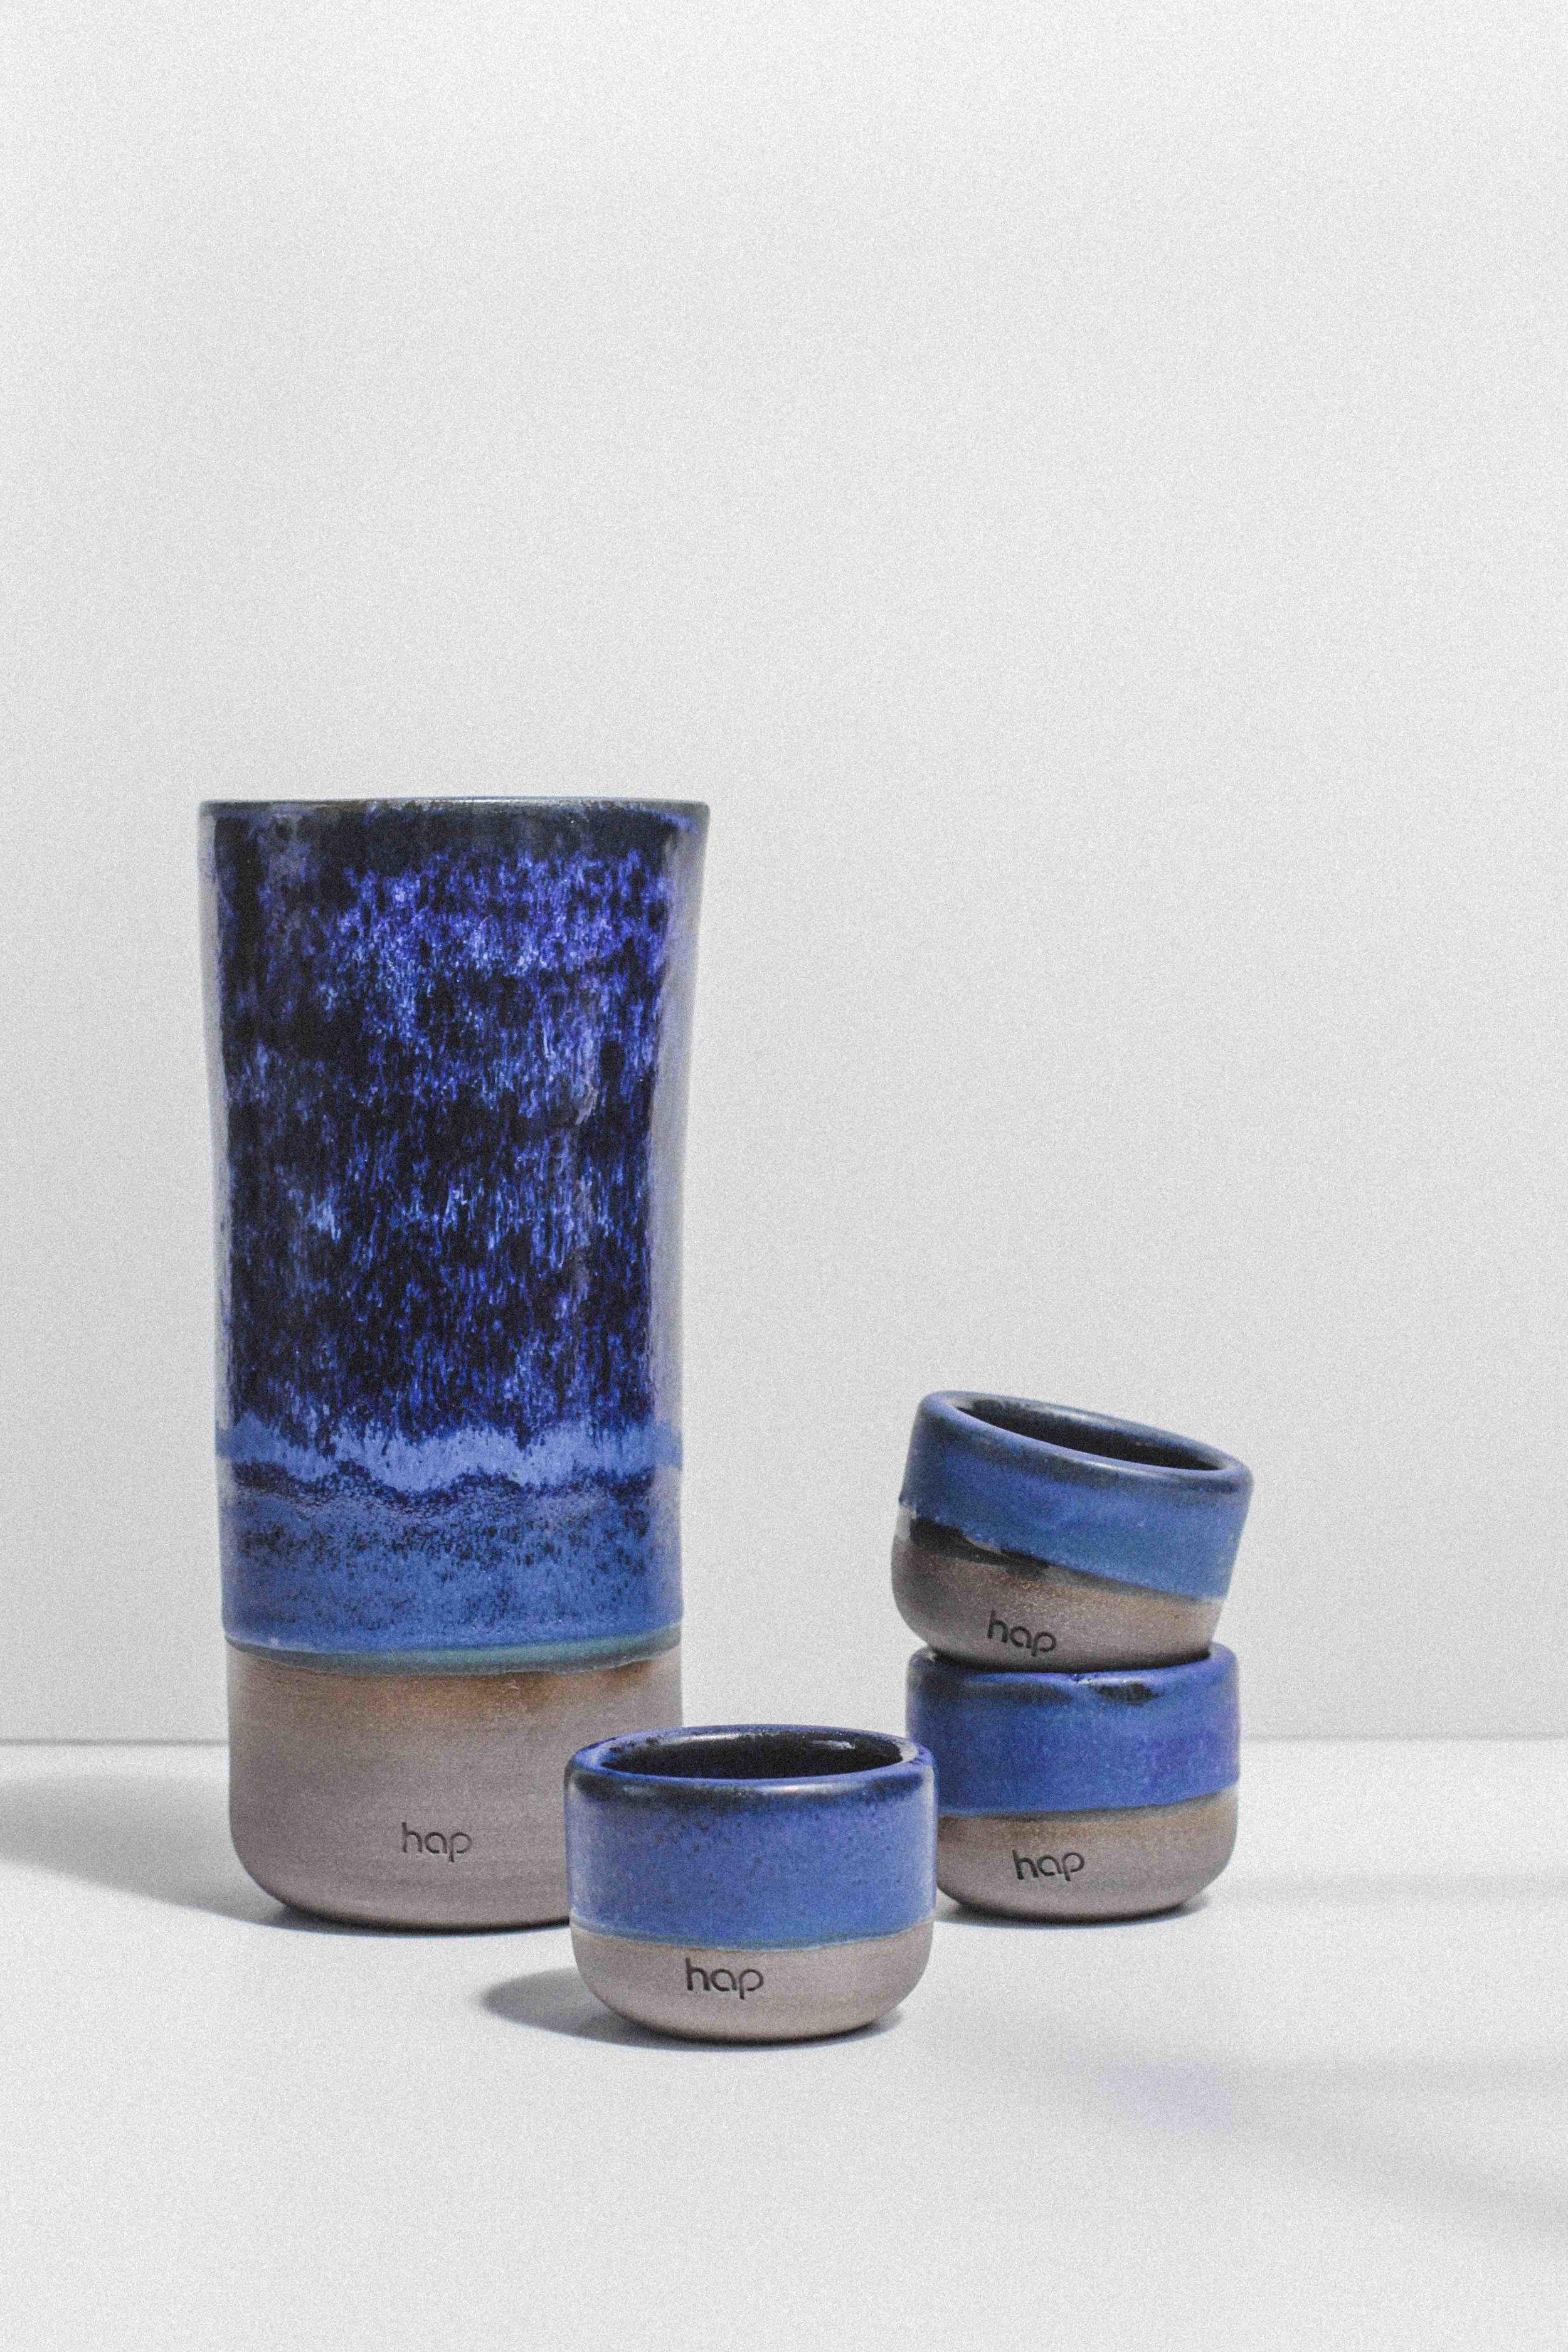 hap ceramics_Maxi Hoffmann_Düsseldorf_Keramik_Ceramics_Karaffe_Becher_Handgemacht_Interior_Design.jpg